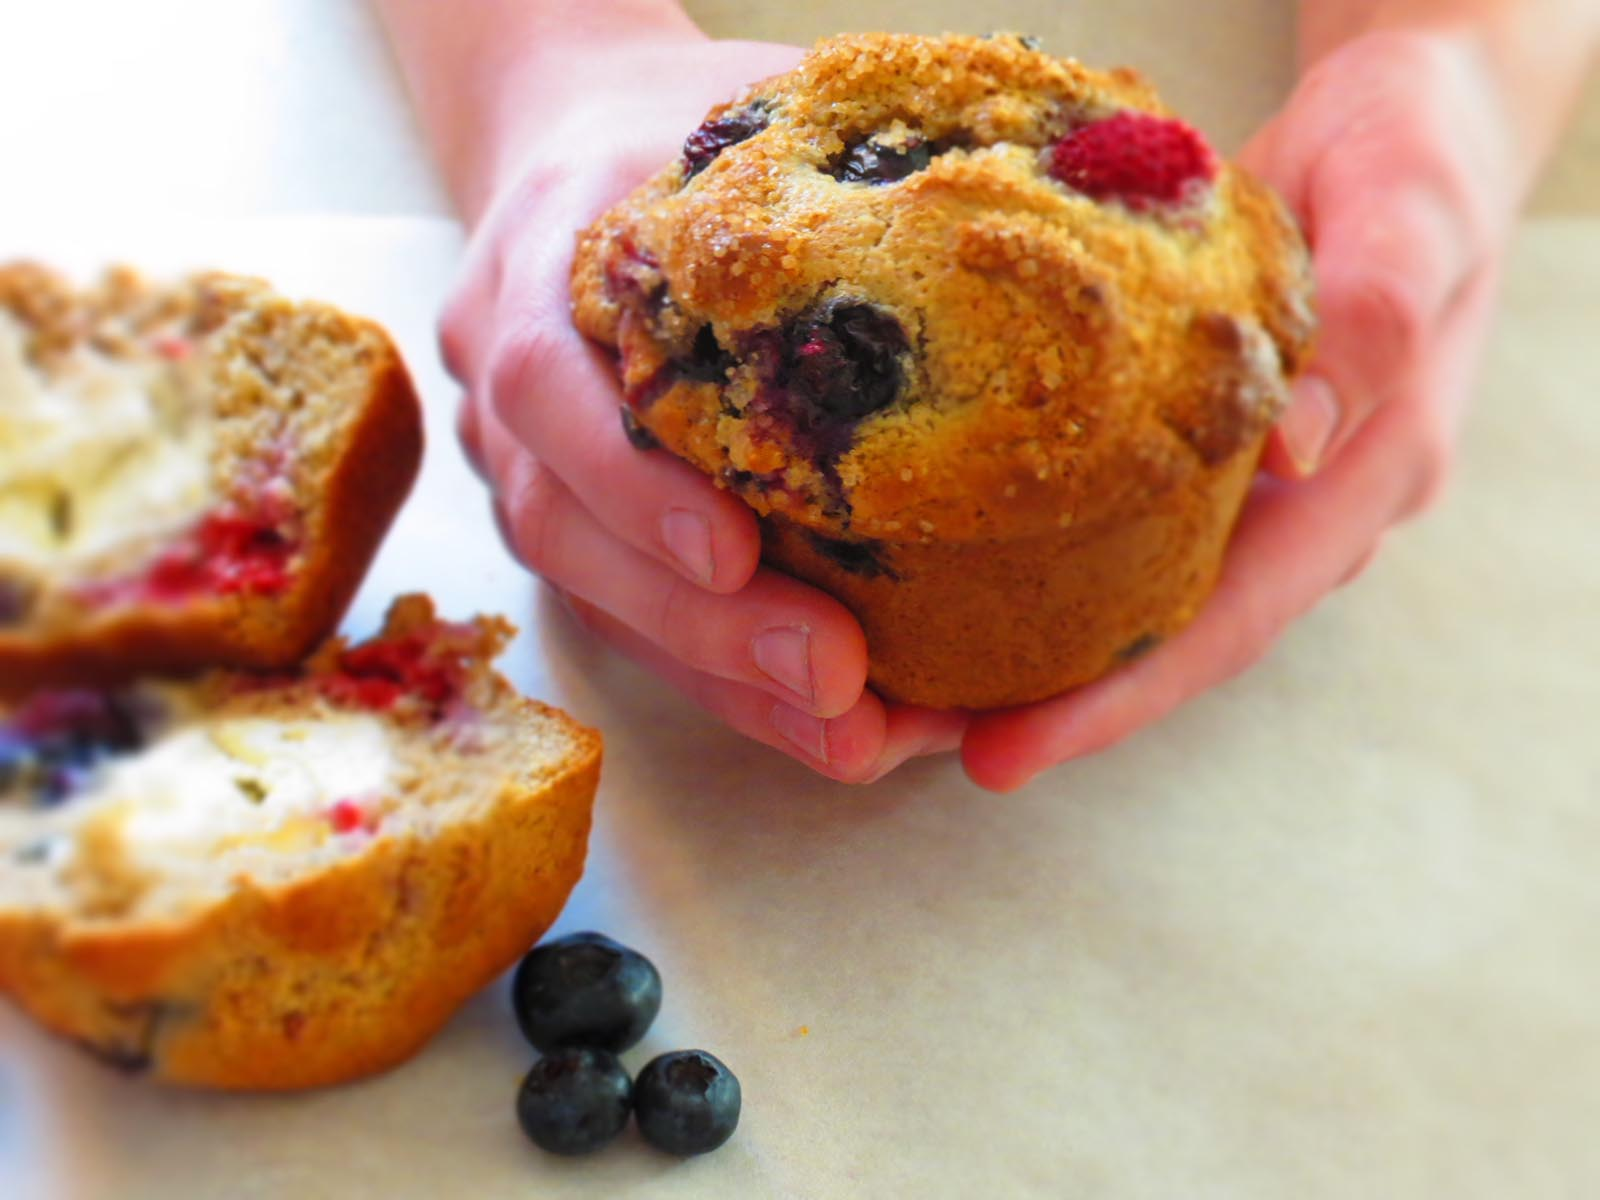 anastasia-holding-muffin